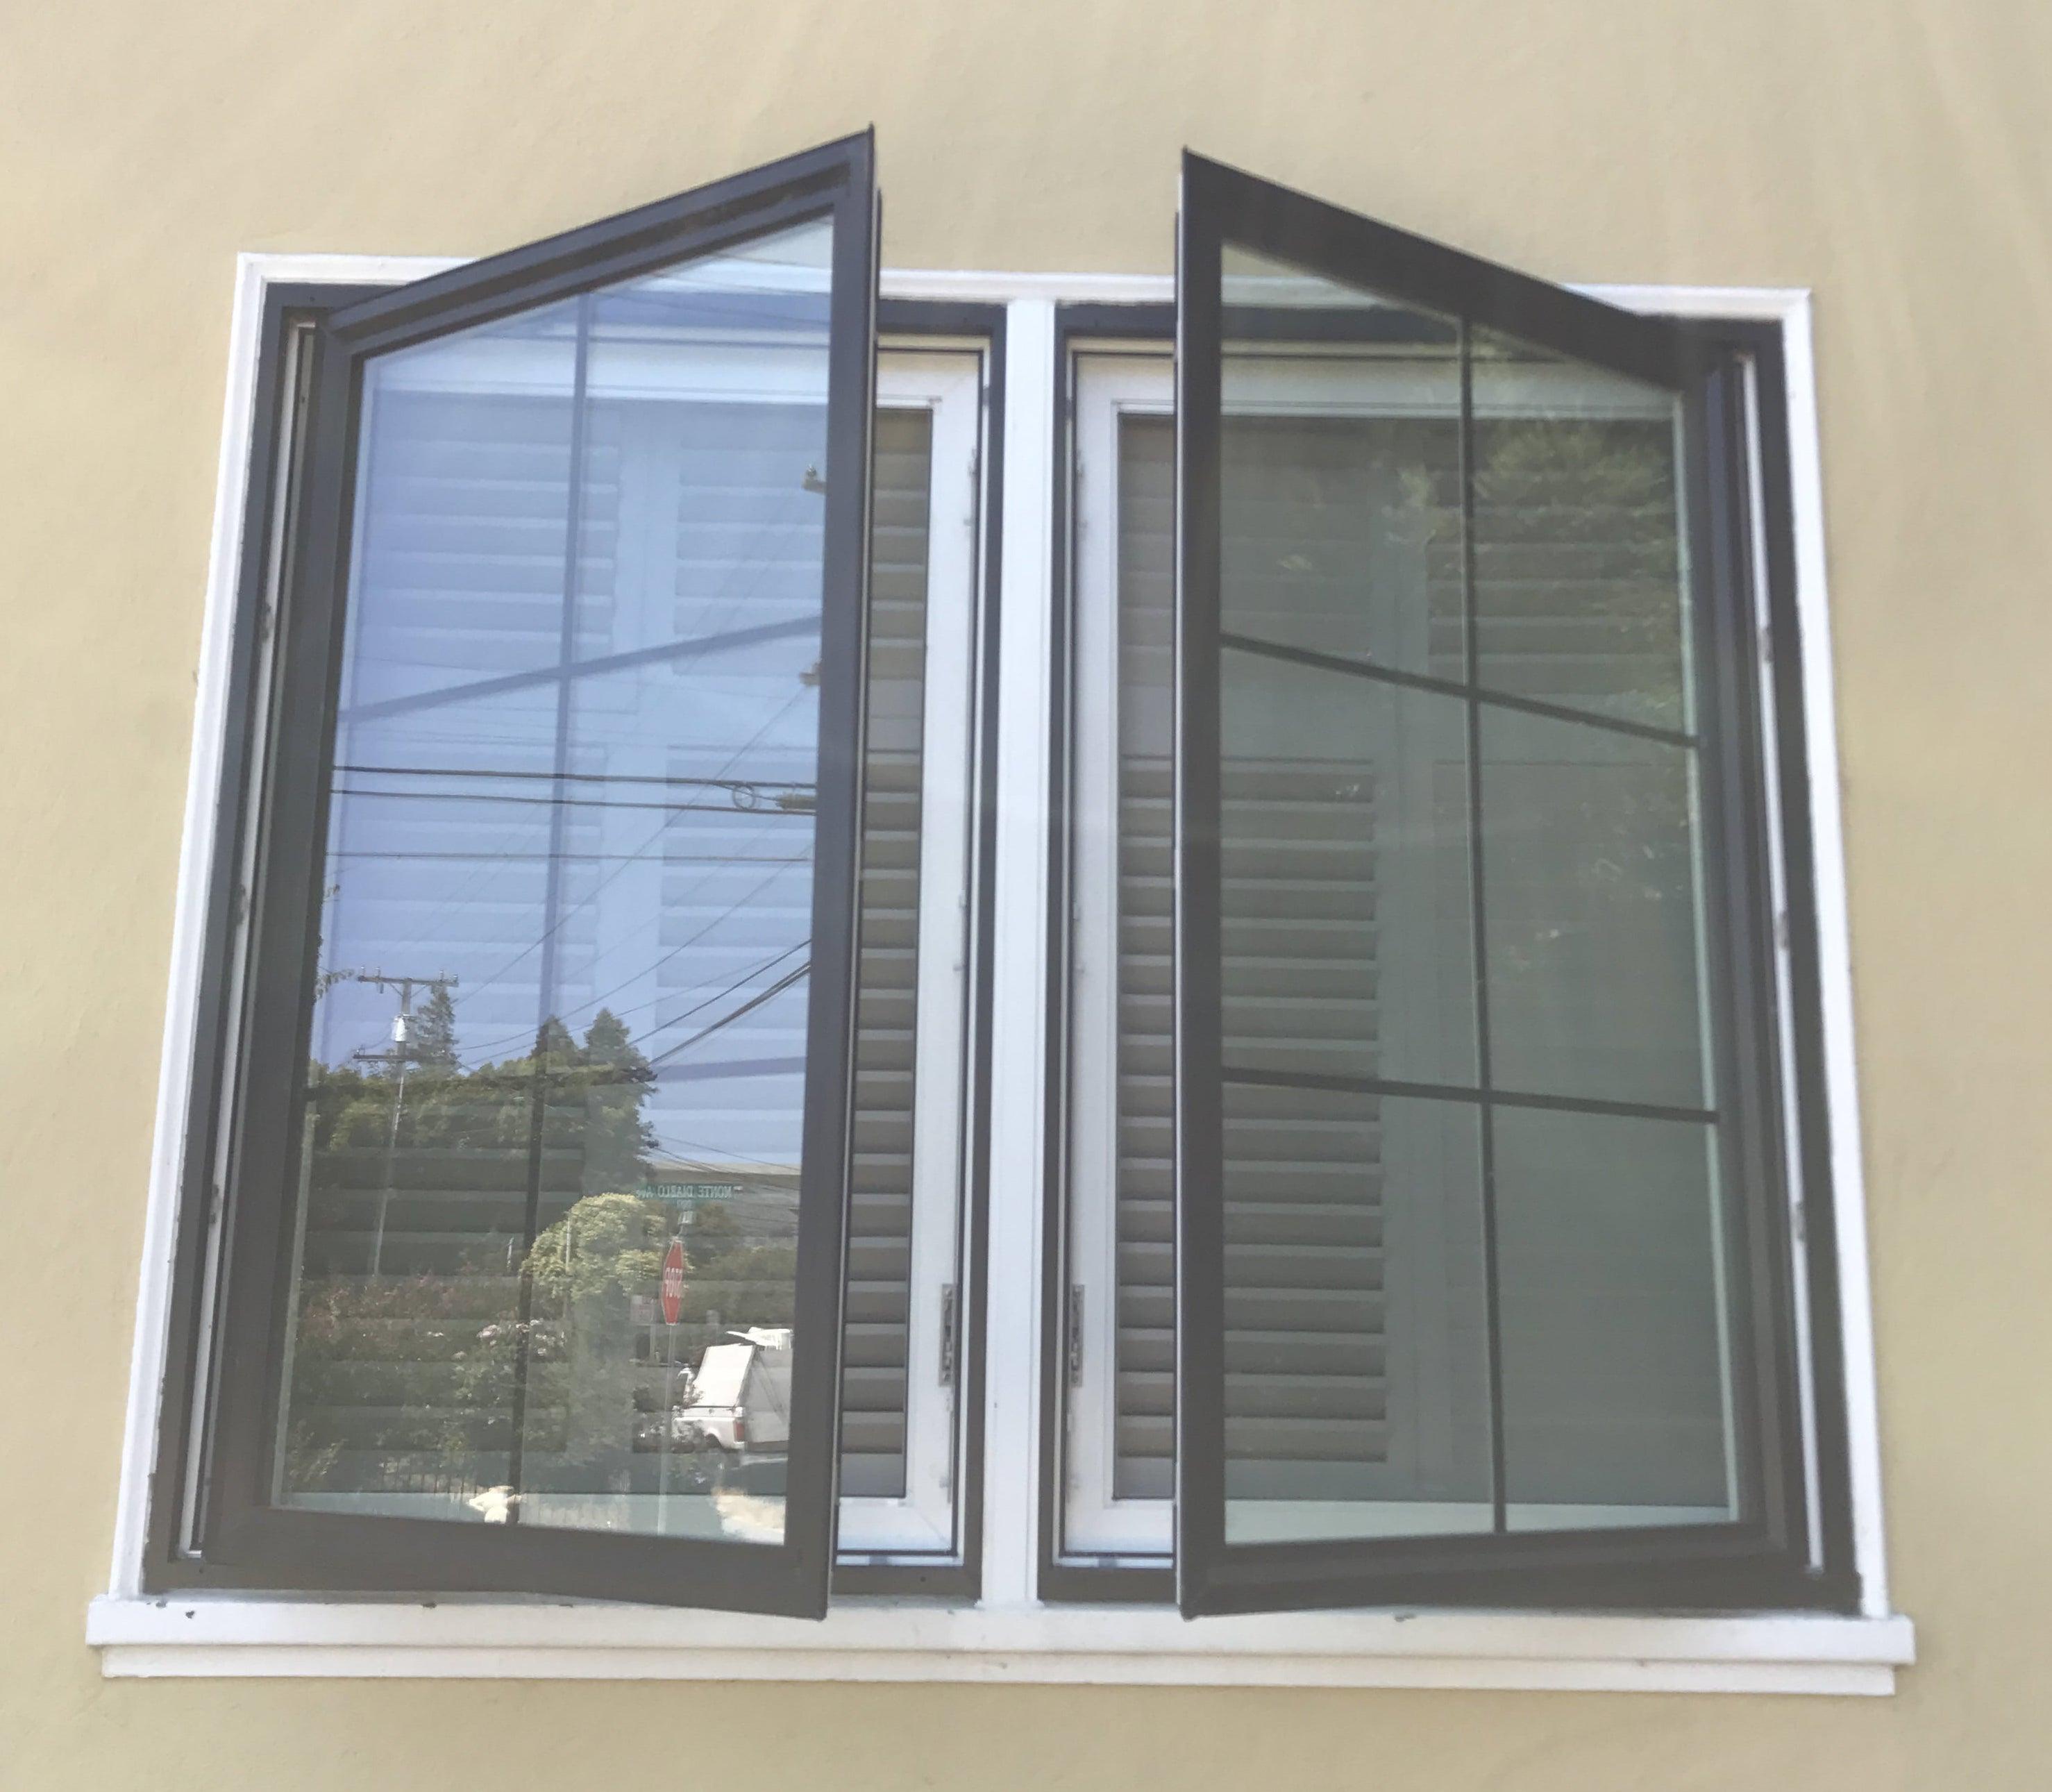 Window final product